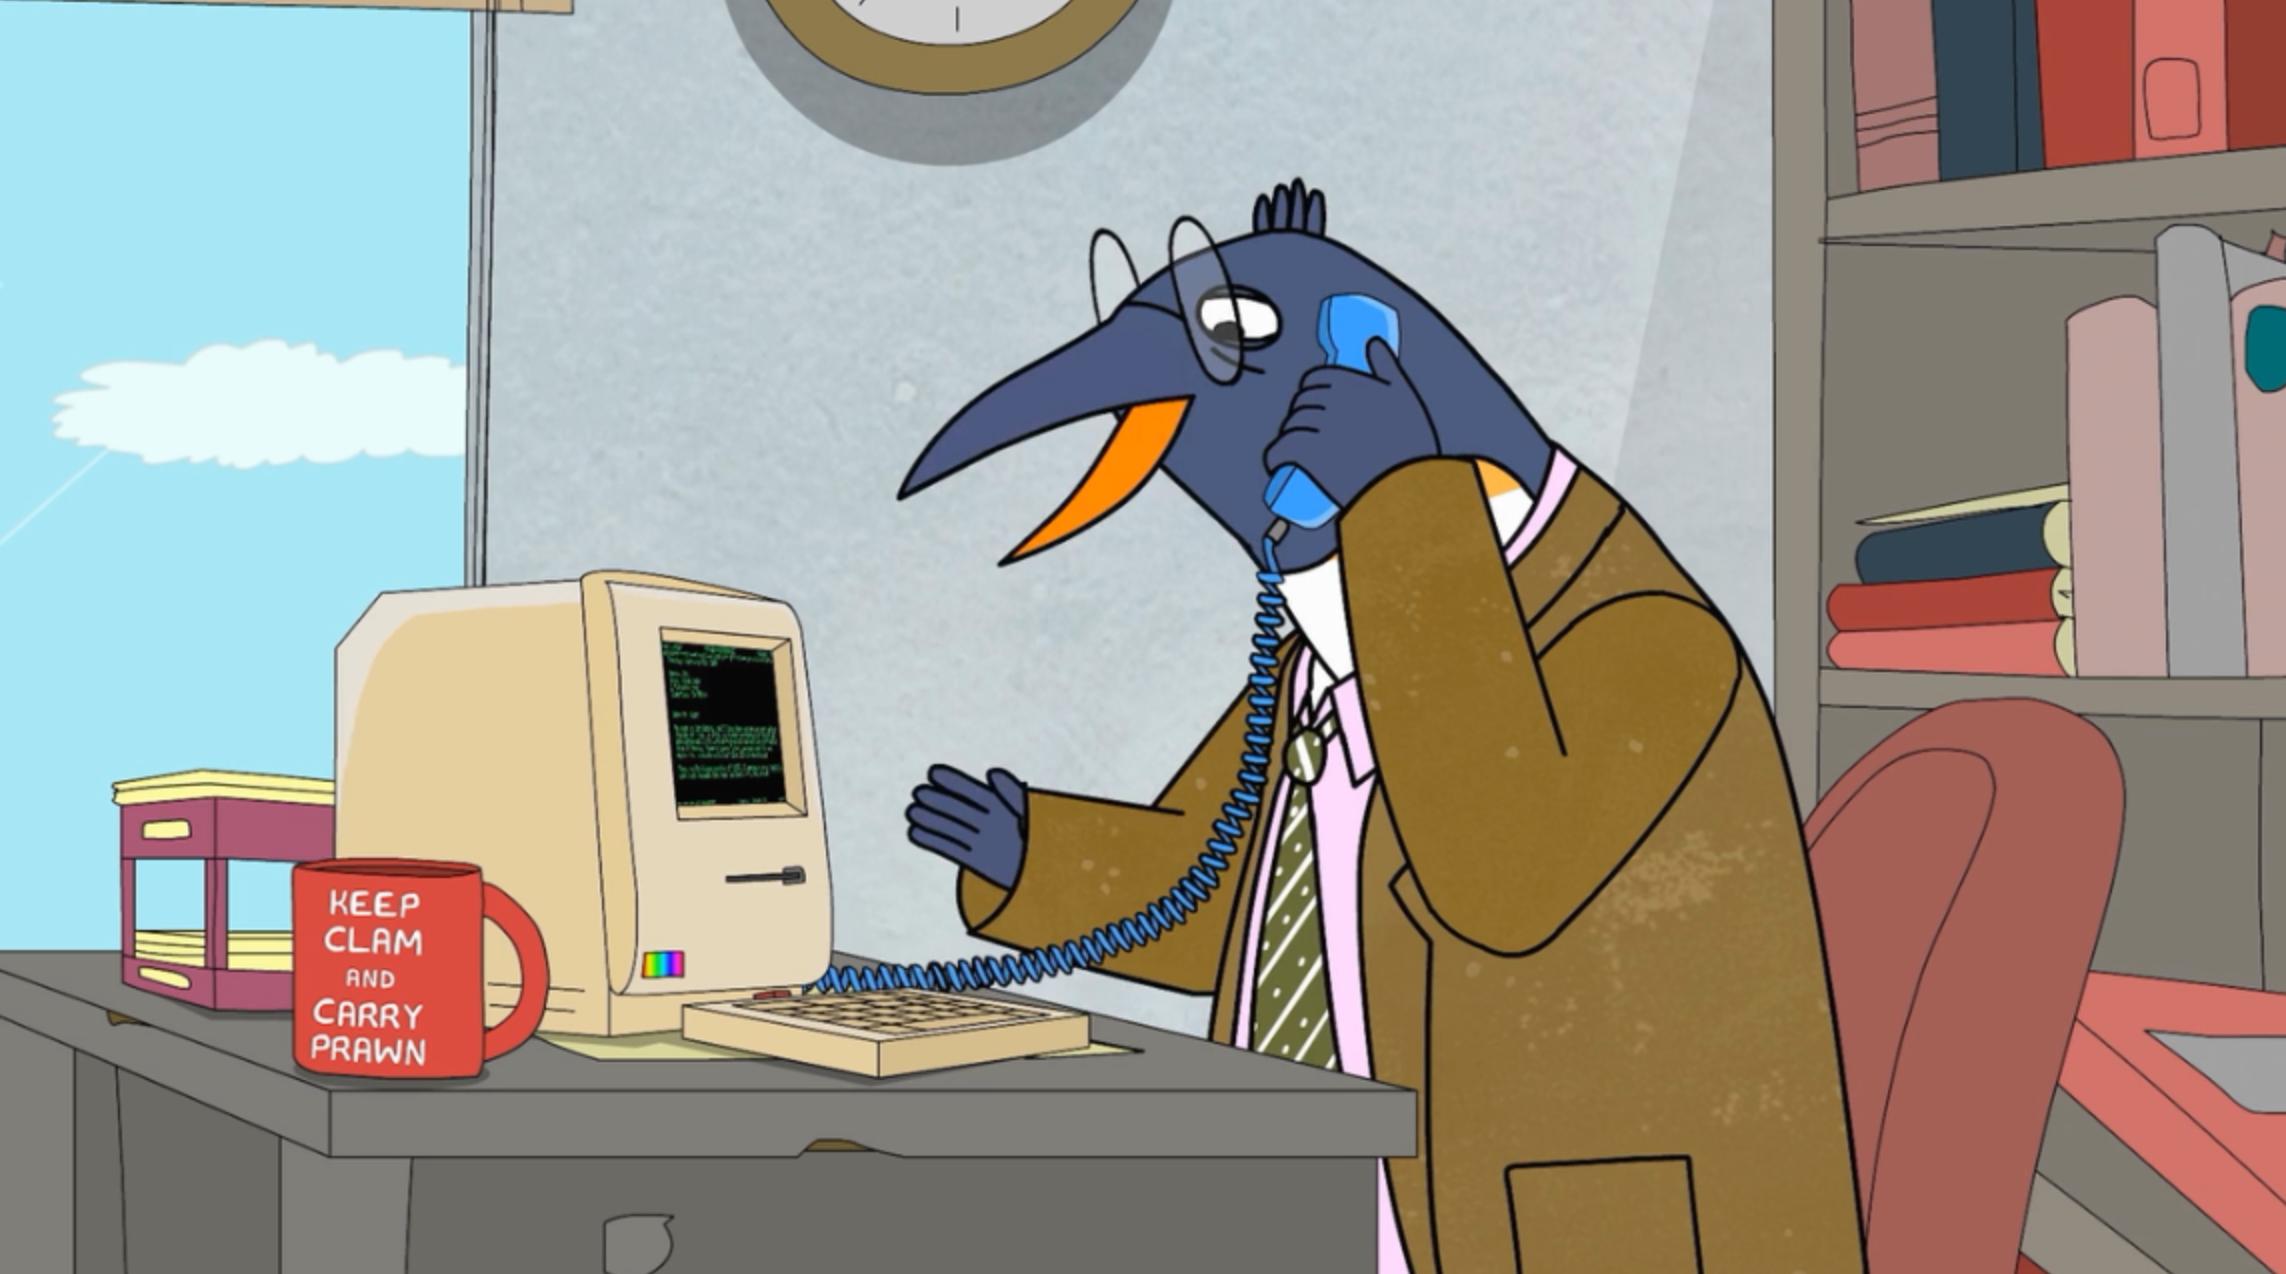 wait a minute larry i forgot my aol password